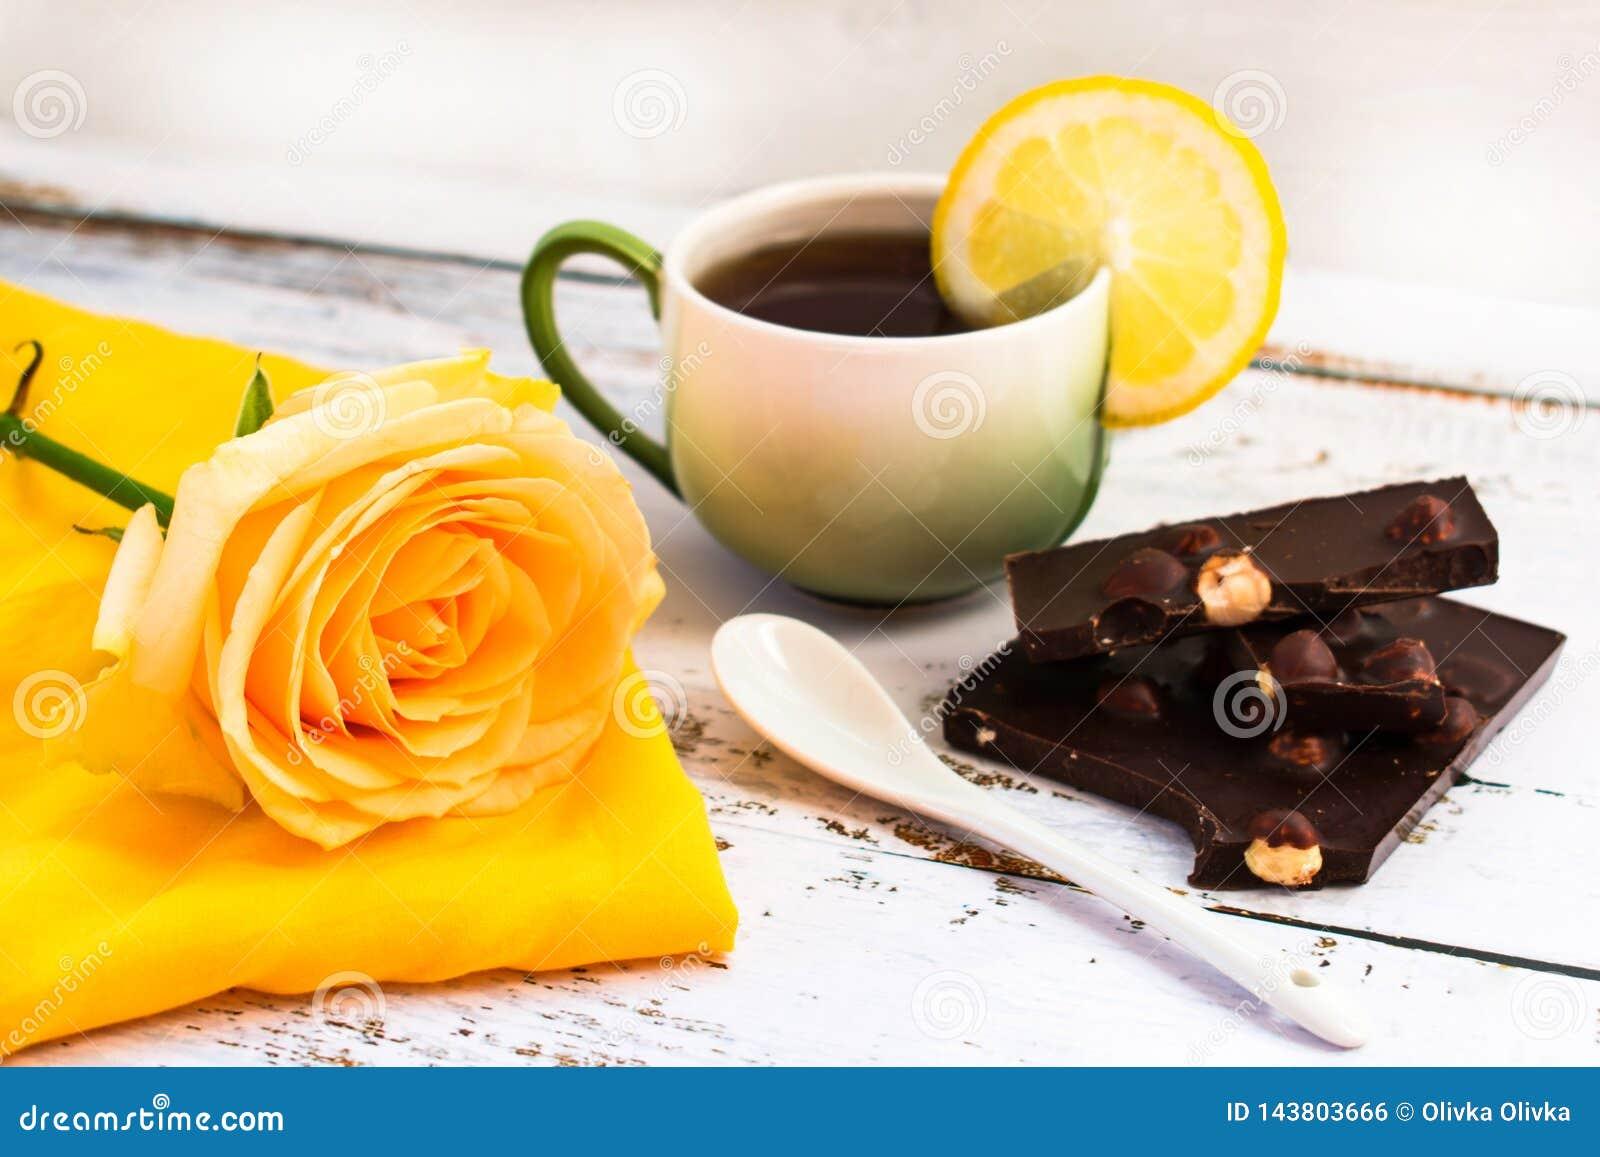 Tea with lemon, rose and black chocolate